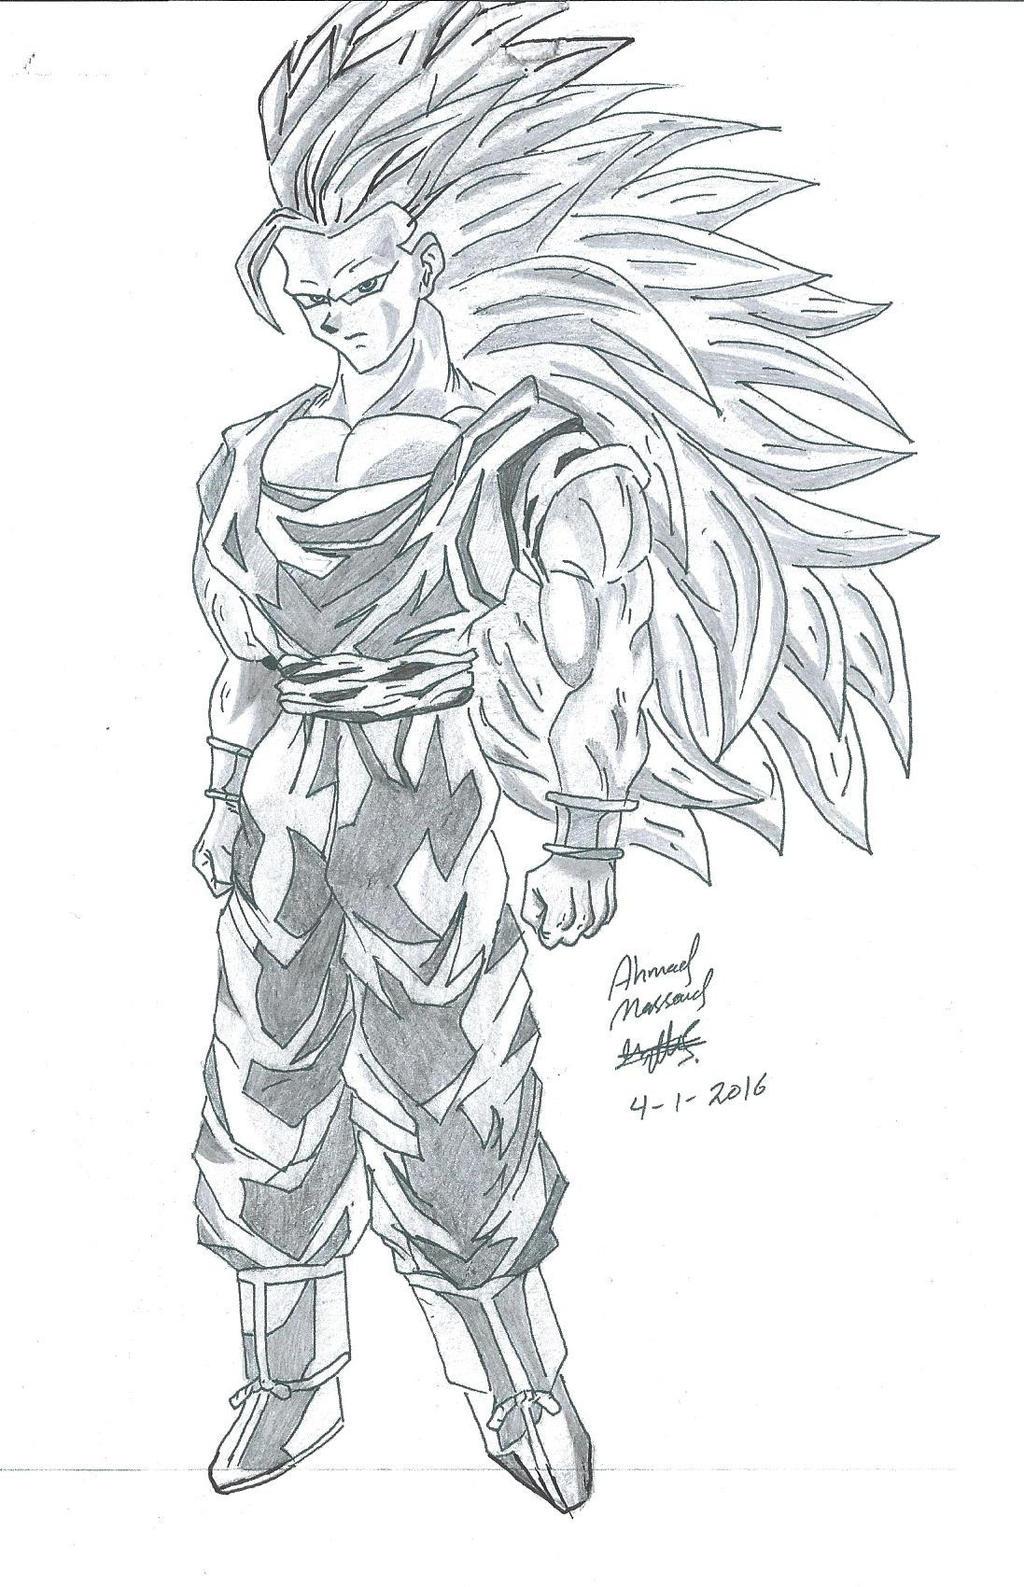 drawing of goku super saiyan 3 by ahmadmass